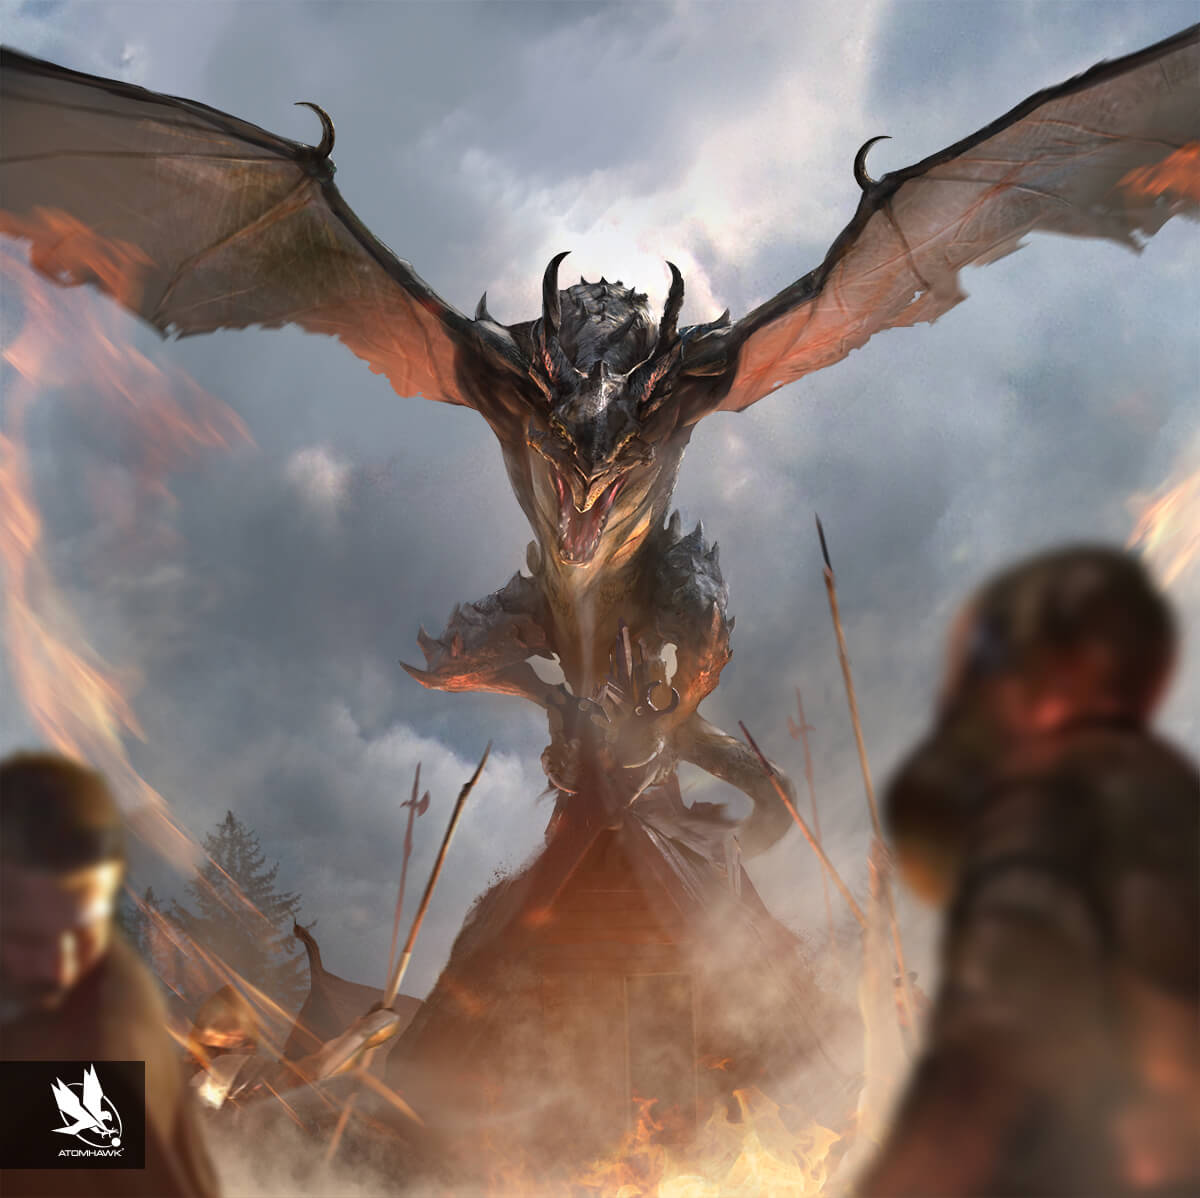 Atomhawk_Bethesda_The-Elder-Scrolls-Legends_Concept-Art_Creature-Design_Enraged-Dragon.jpg